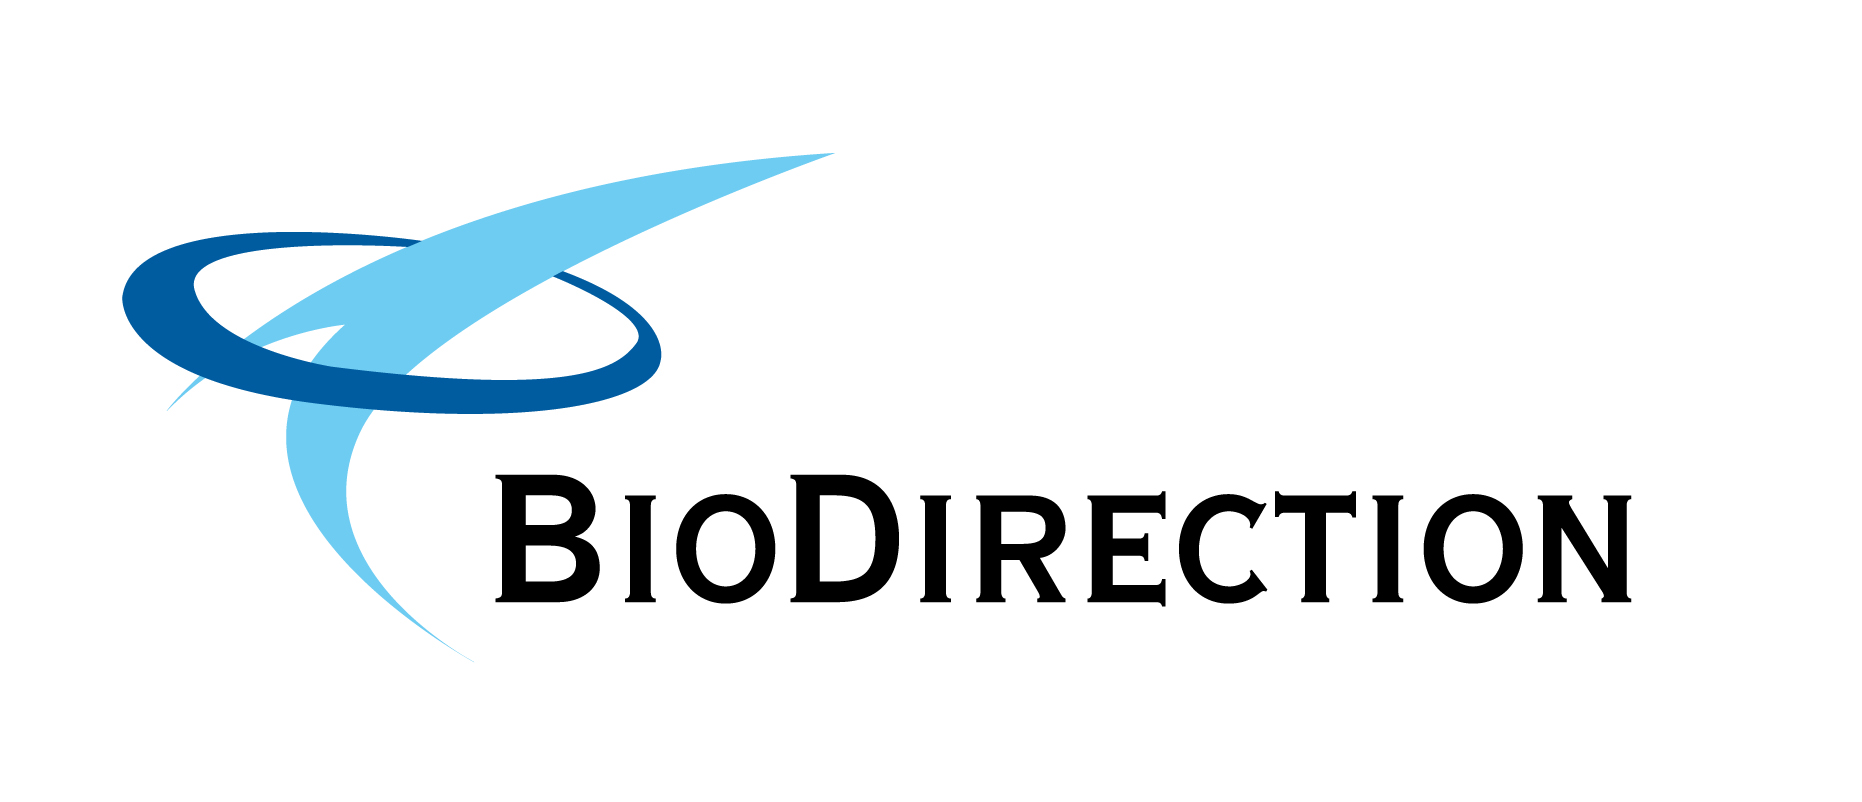 BioDirection Logo jpeg - Sharad Joshi.jpg